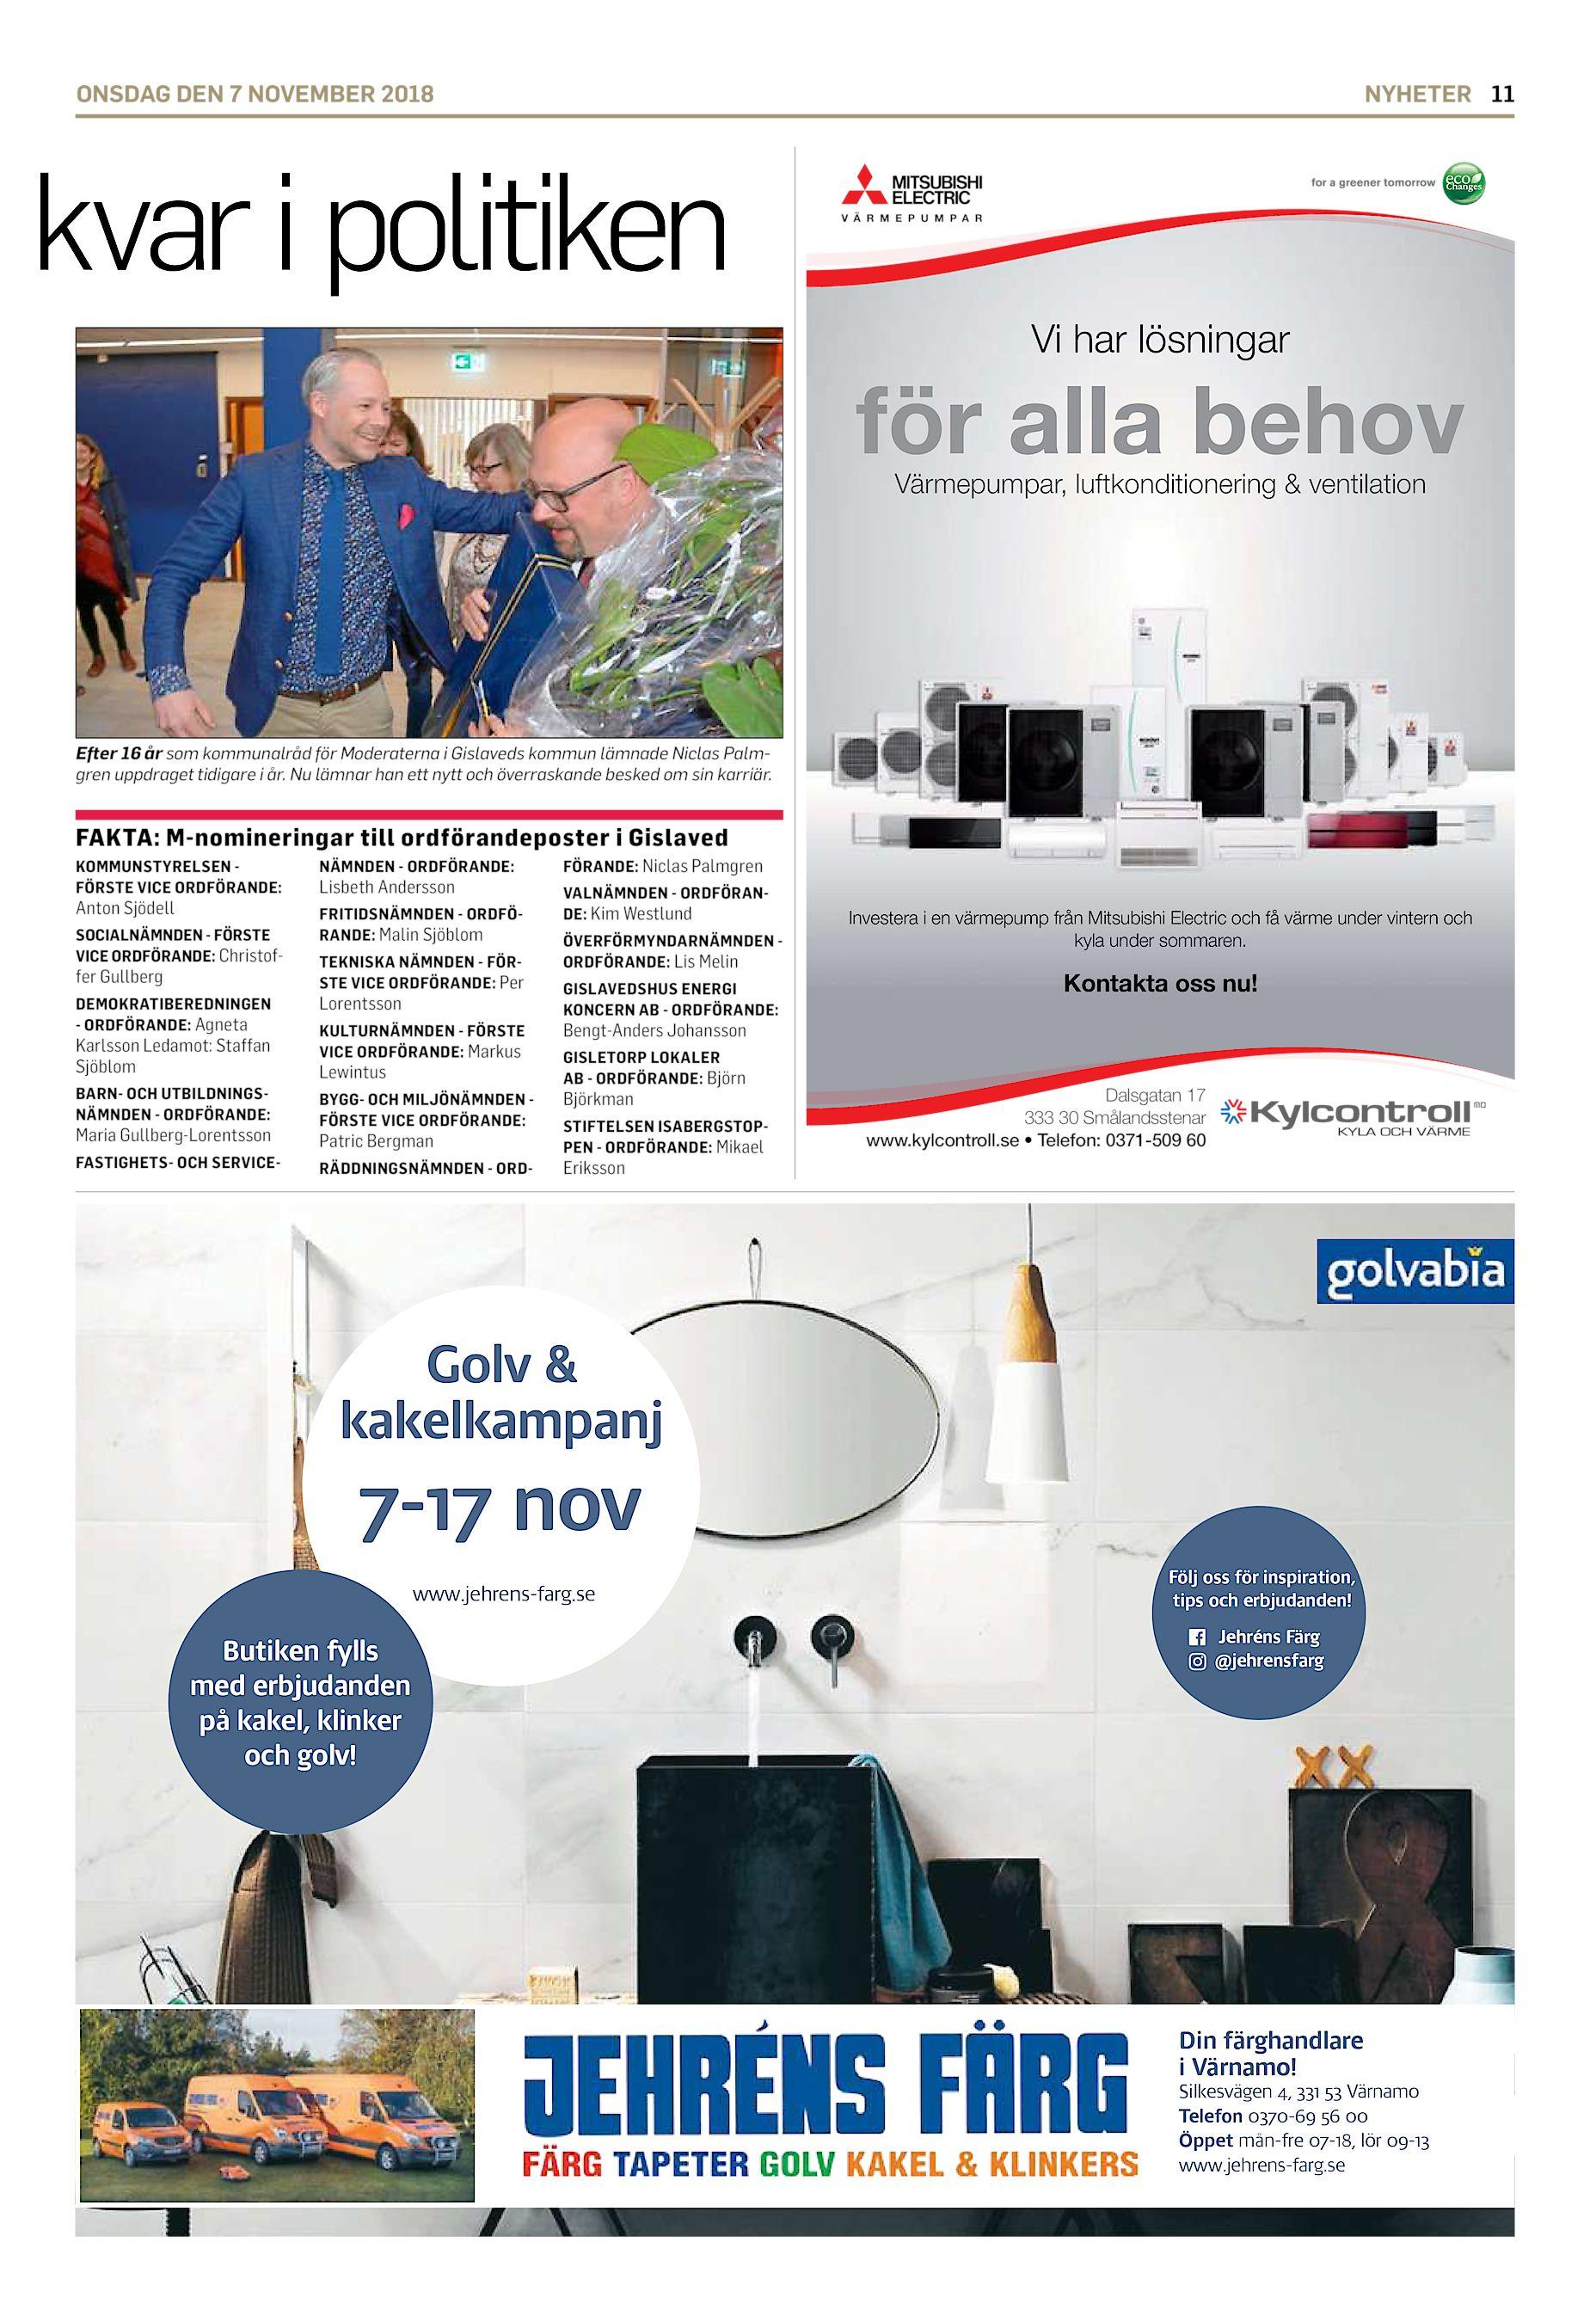 Finnveden.nu FNU-20181107 (endast text) 65a33603da768